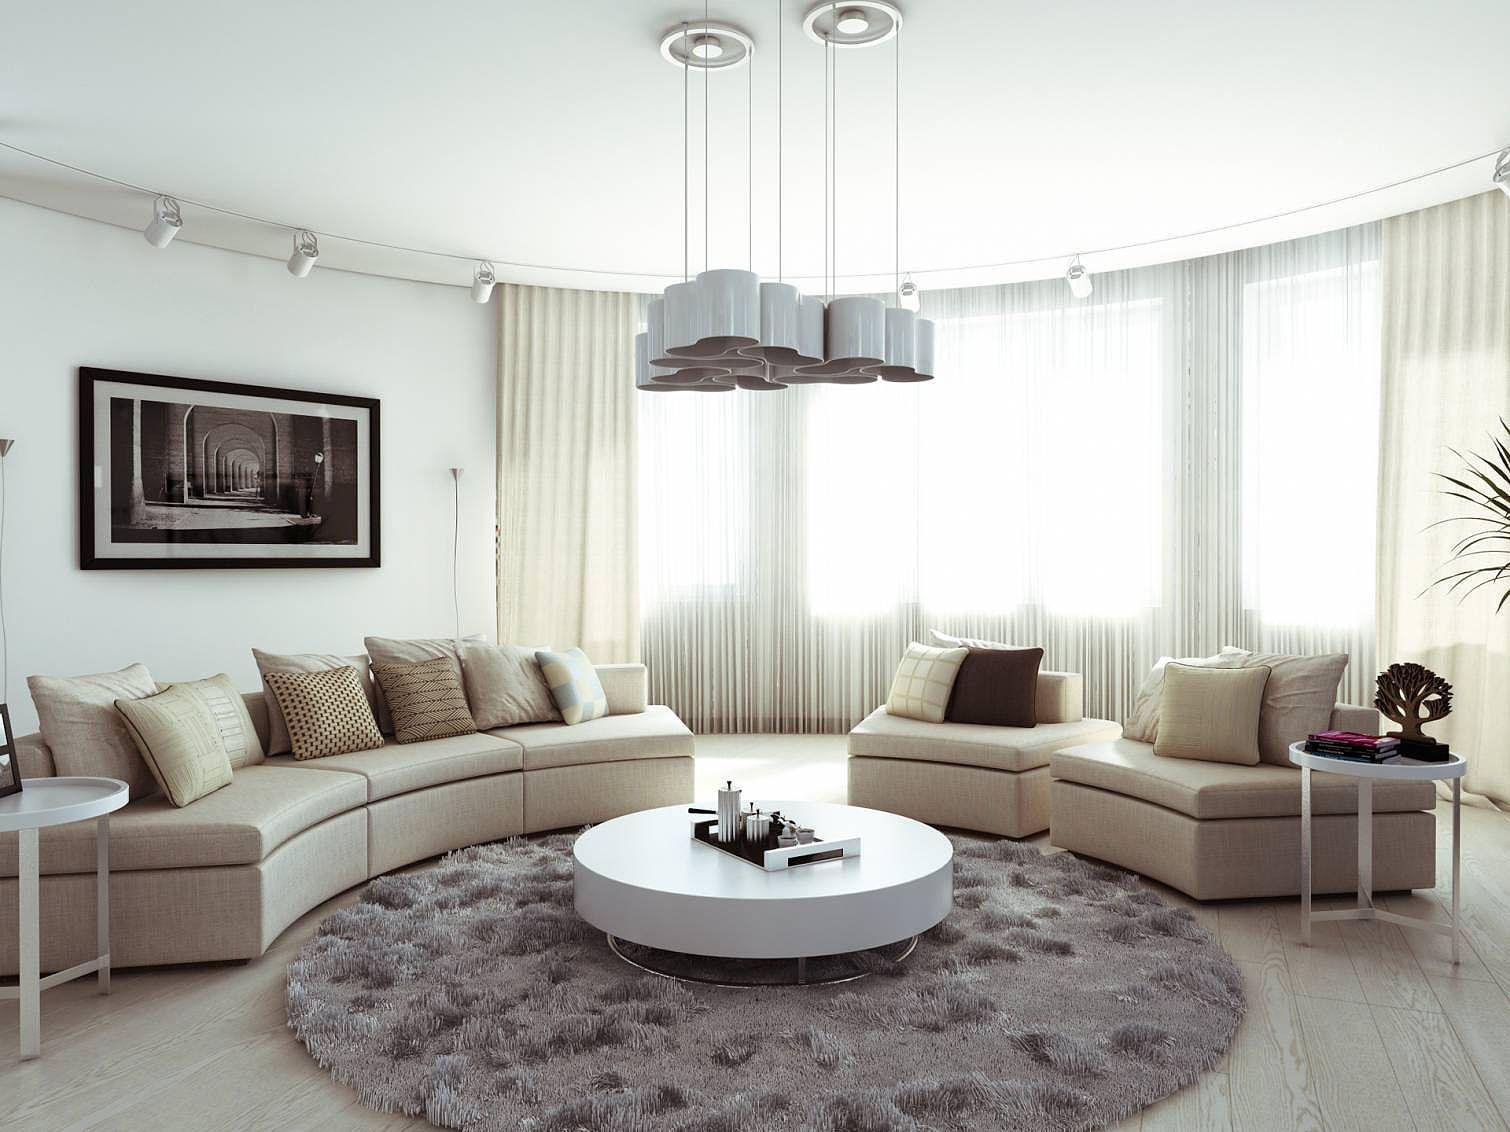 Unique Interior Decoration Style With Contemporary Round Area Rugs ...